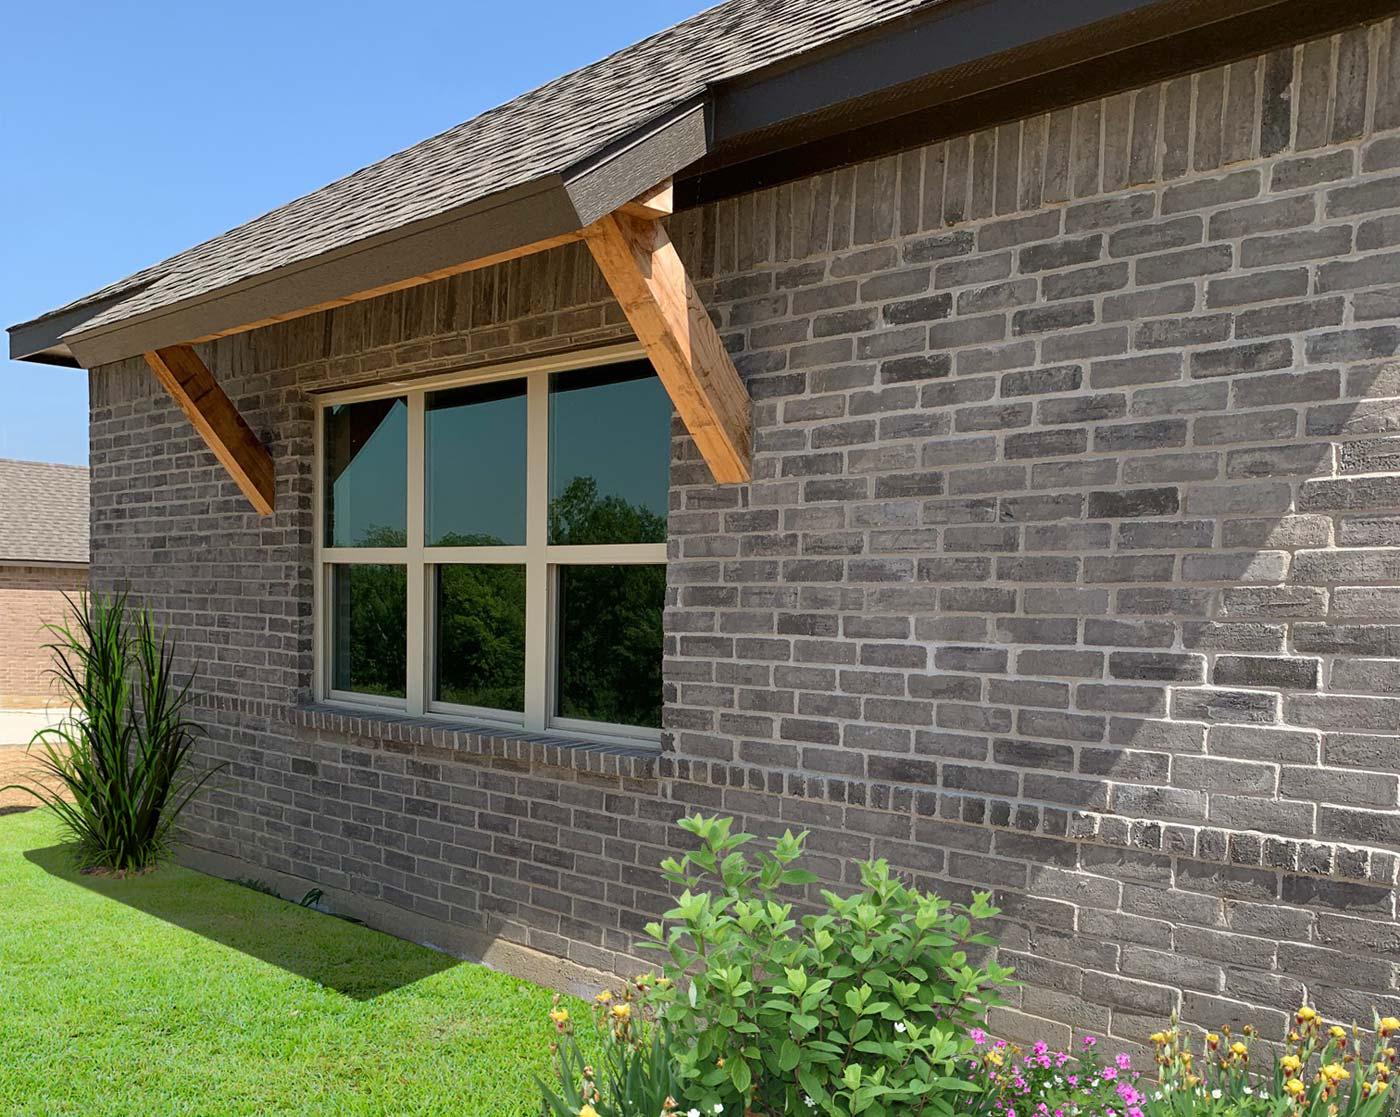 Bilco Brick Onyx Residential building